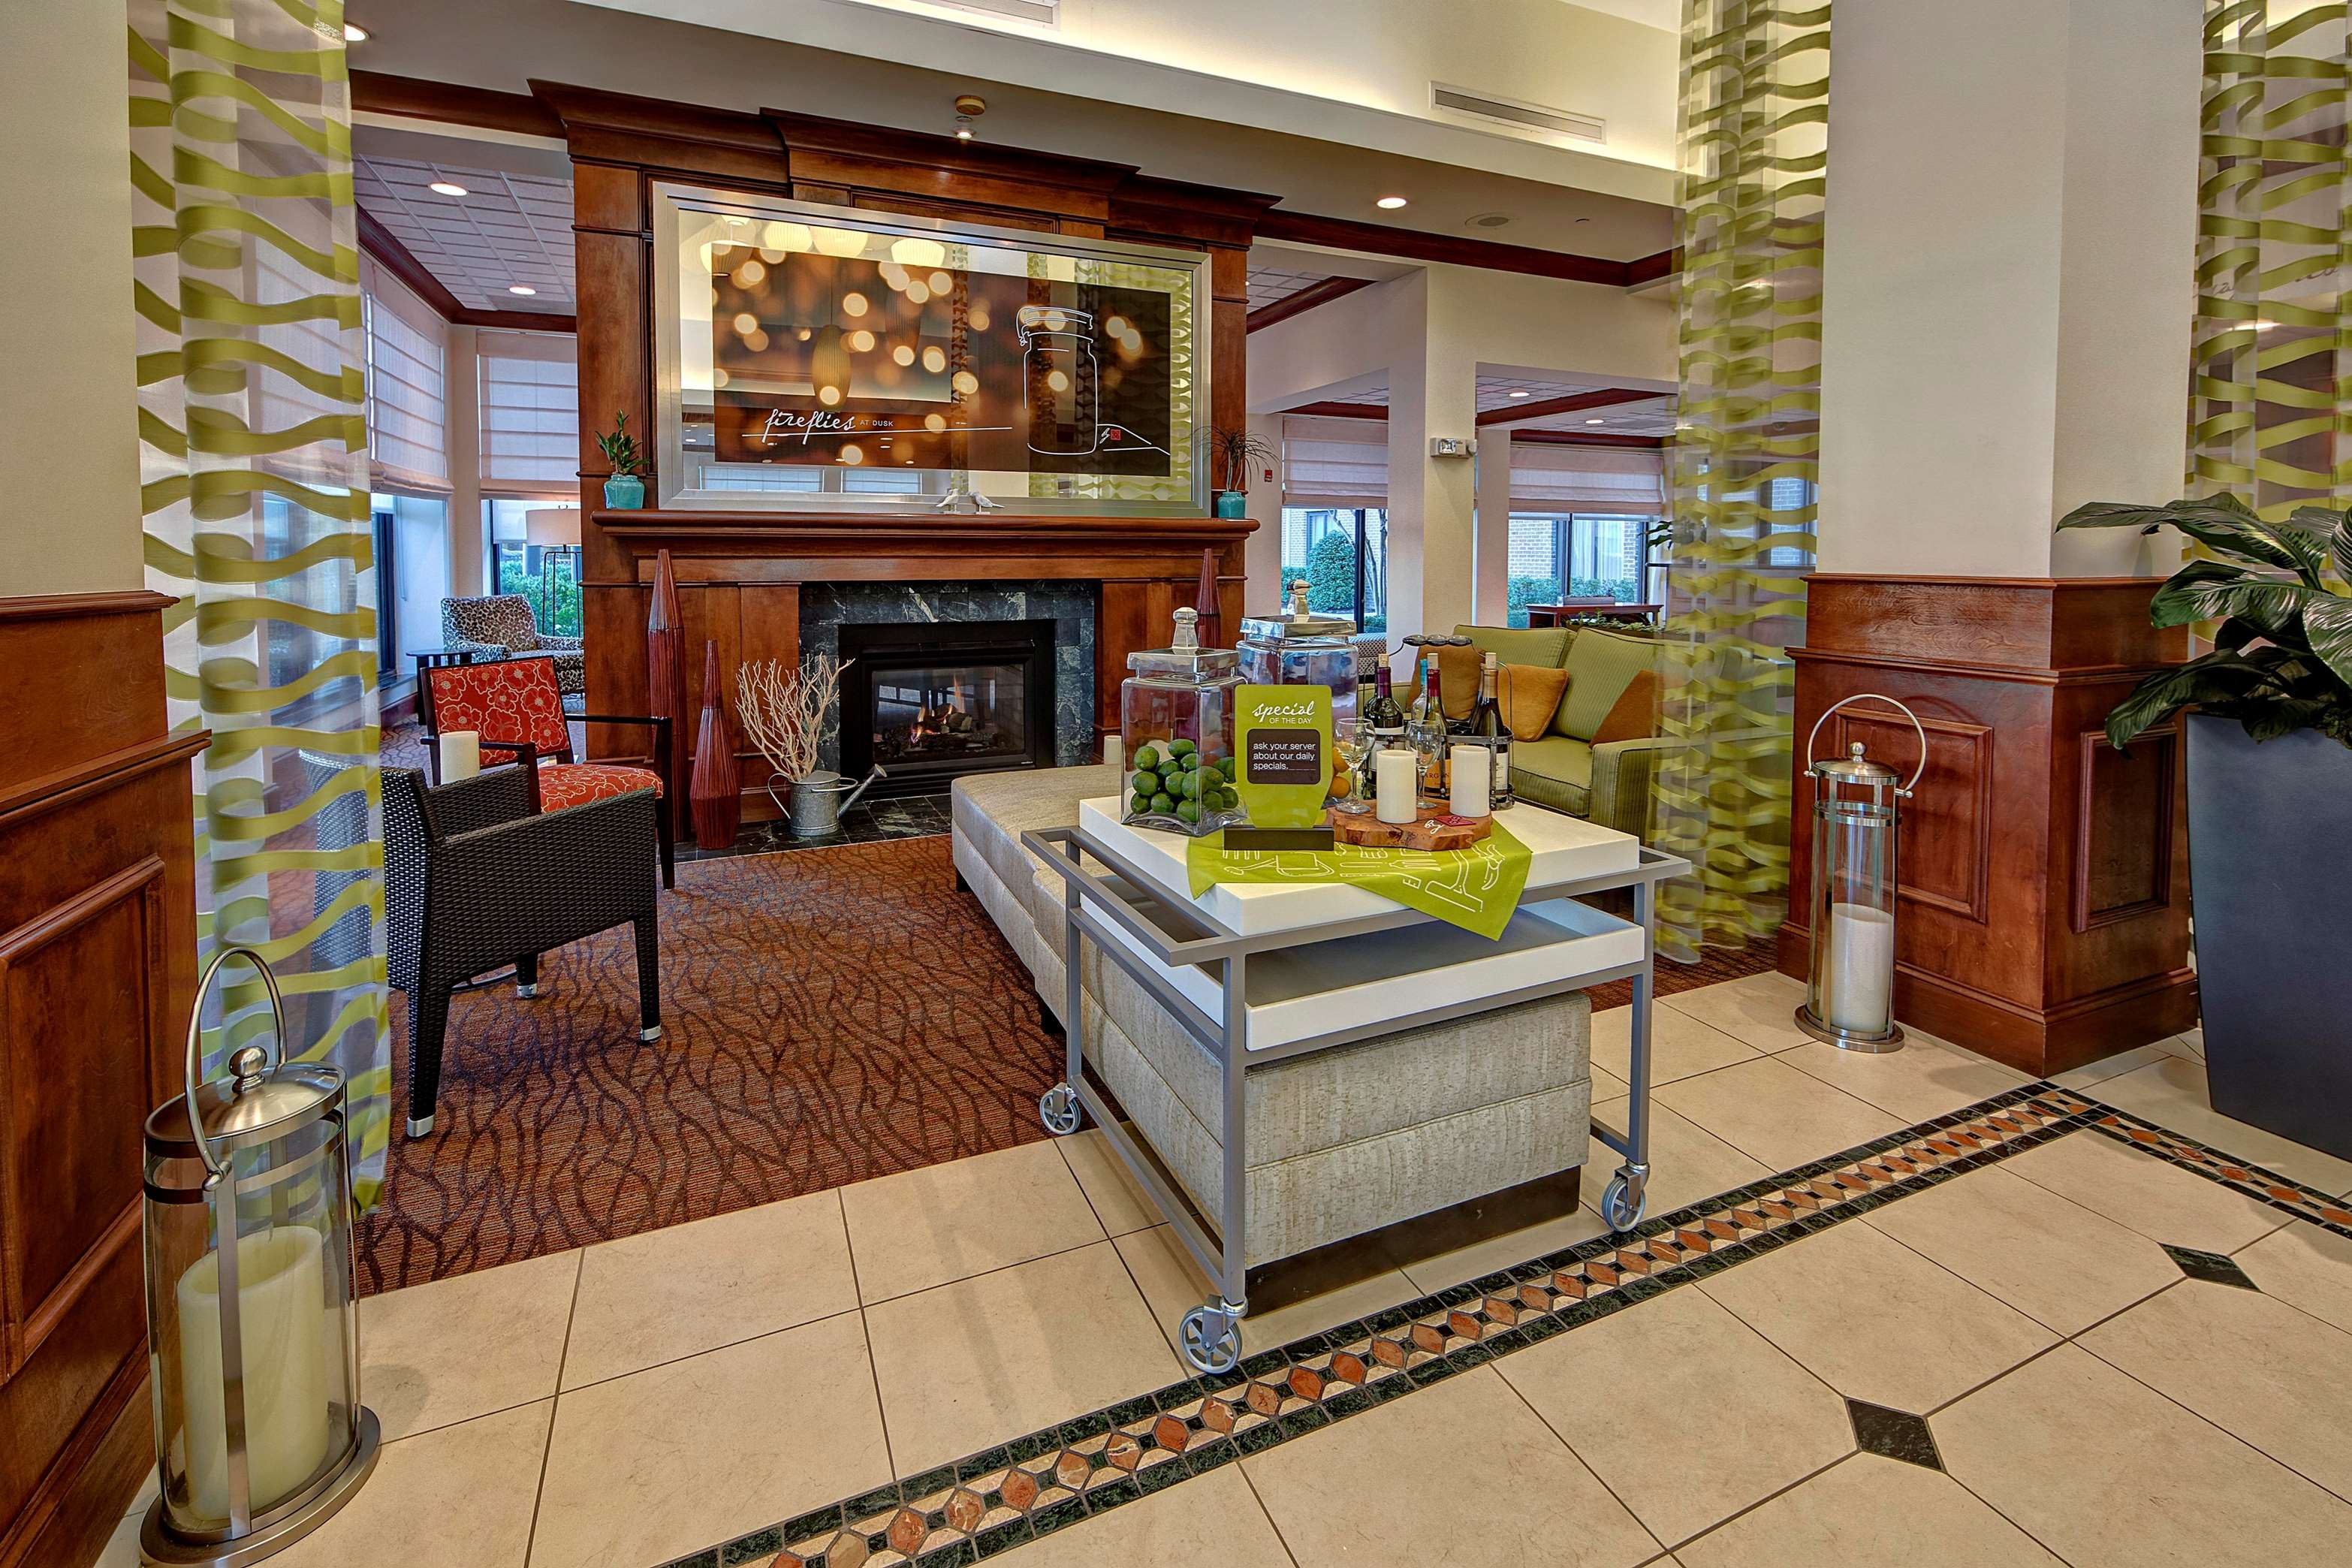 Hilton Garden Inn Memphis/Southaven, MS image 17